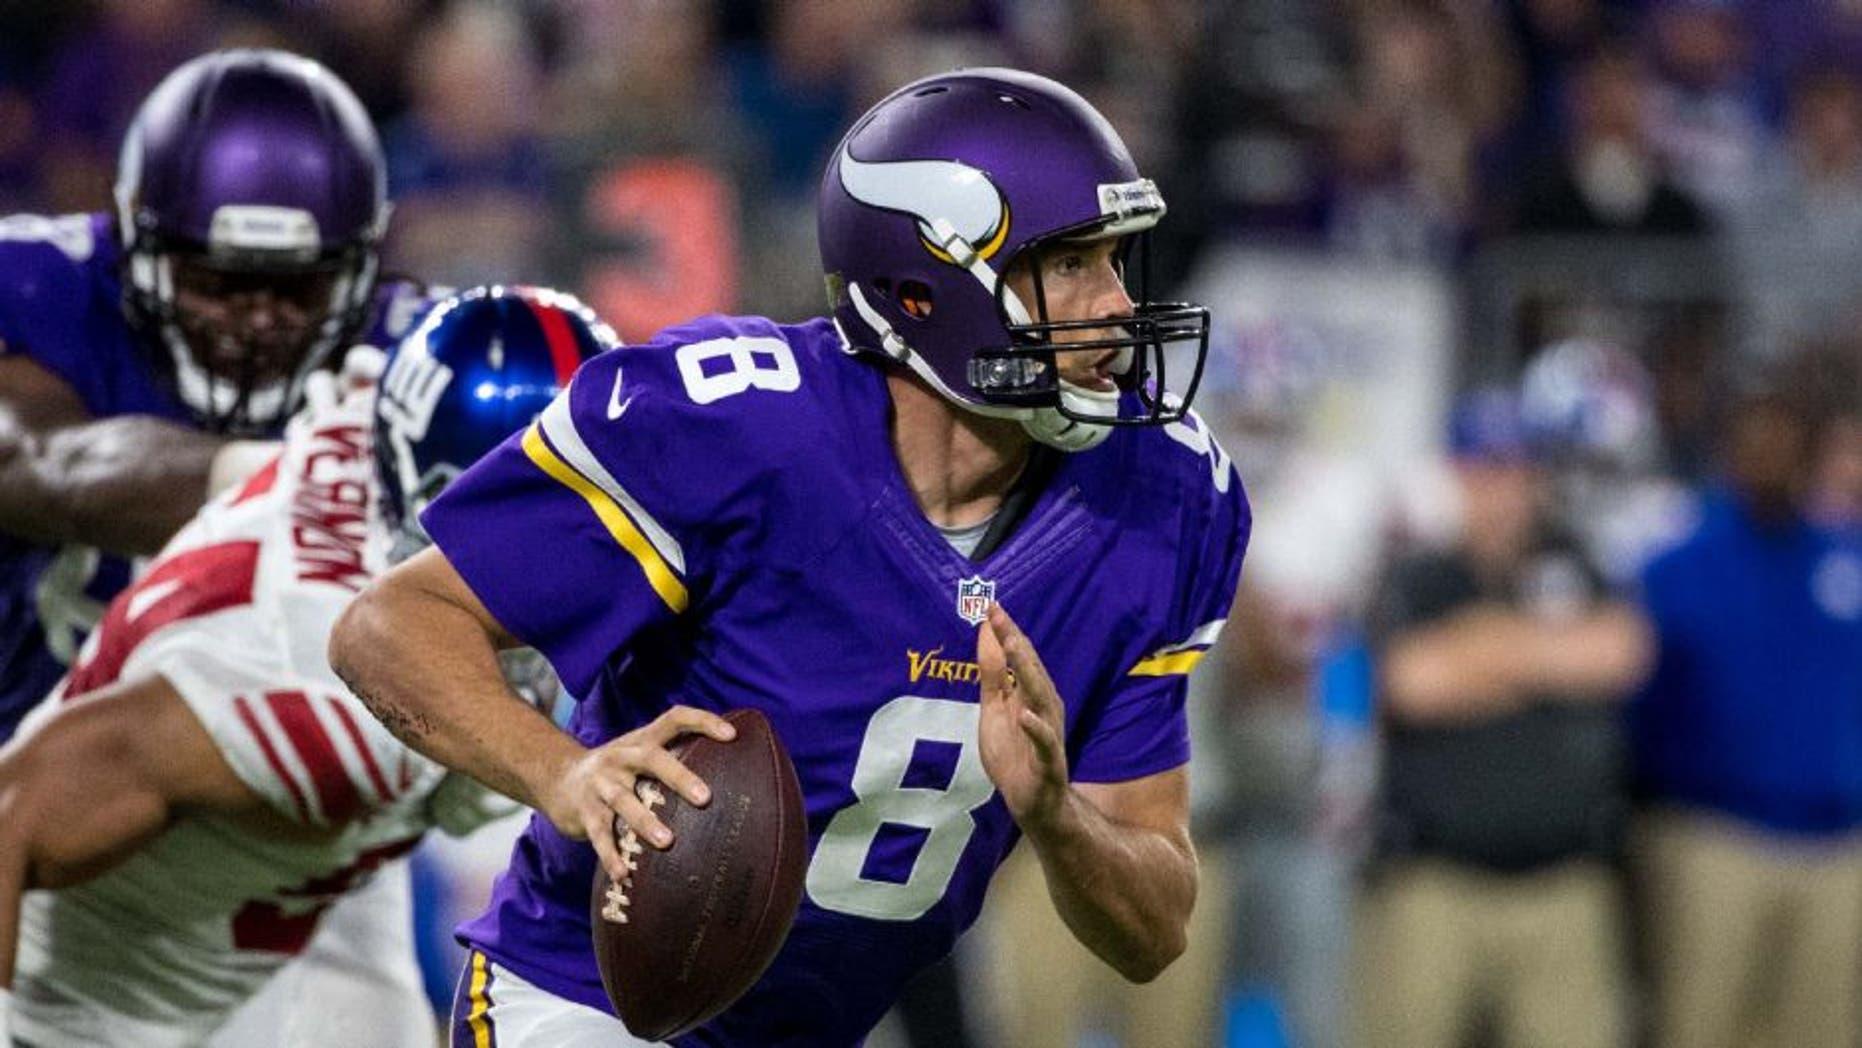 Minnesota Vikings quarterback Sam Bradford throws against the New York Giants.